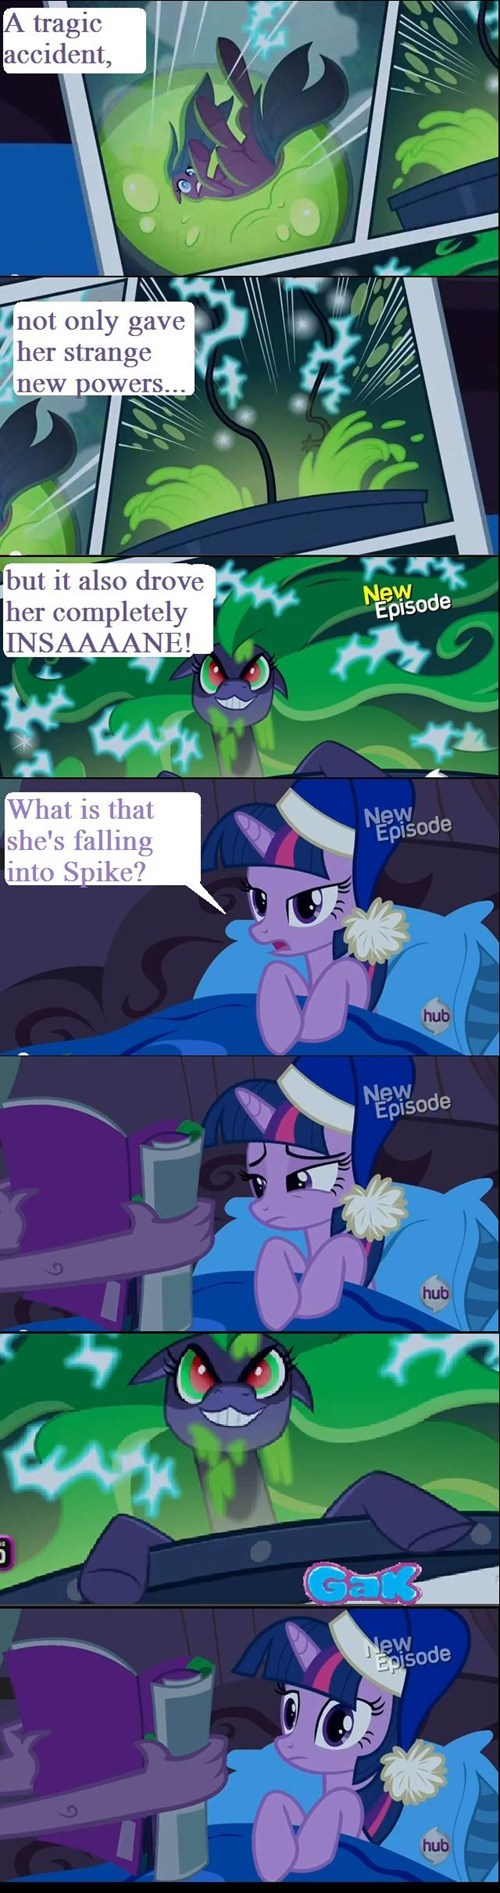 twilight sparkle gak mane-iac - 7966869760